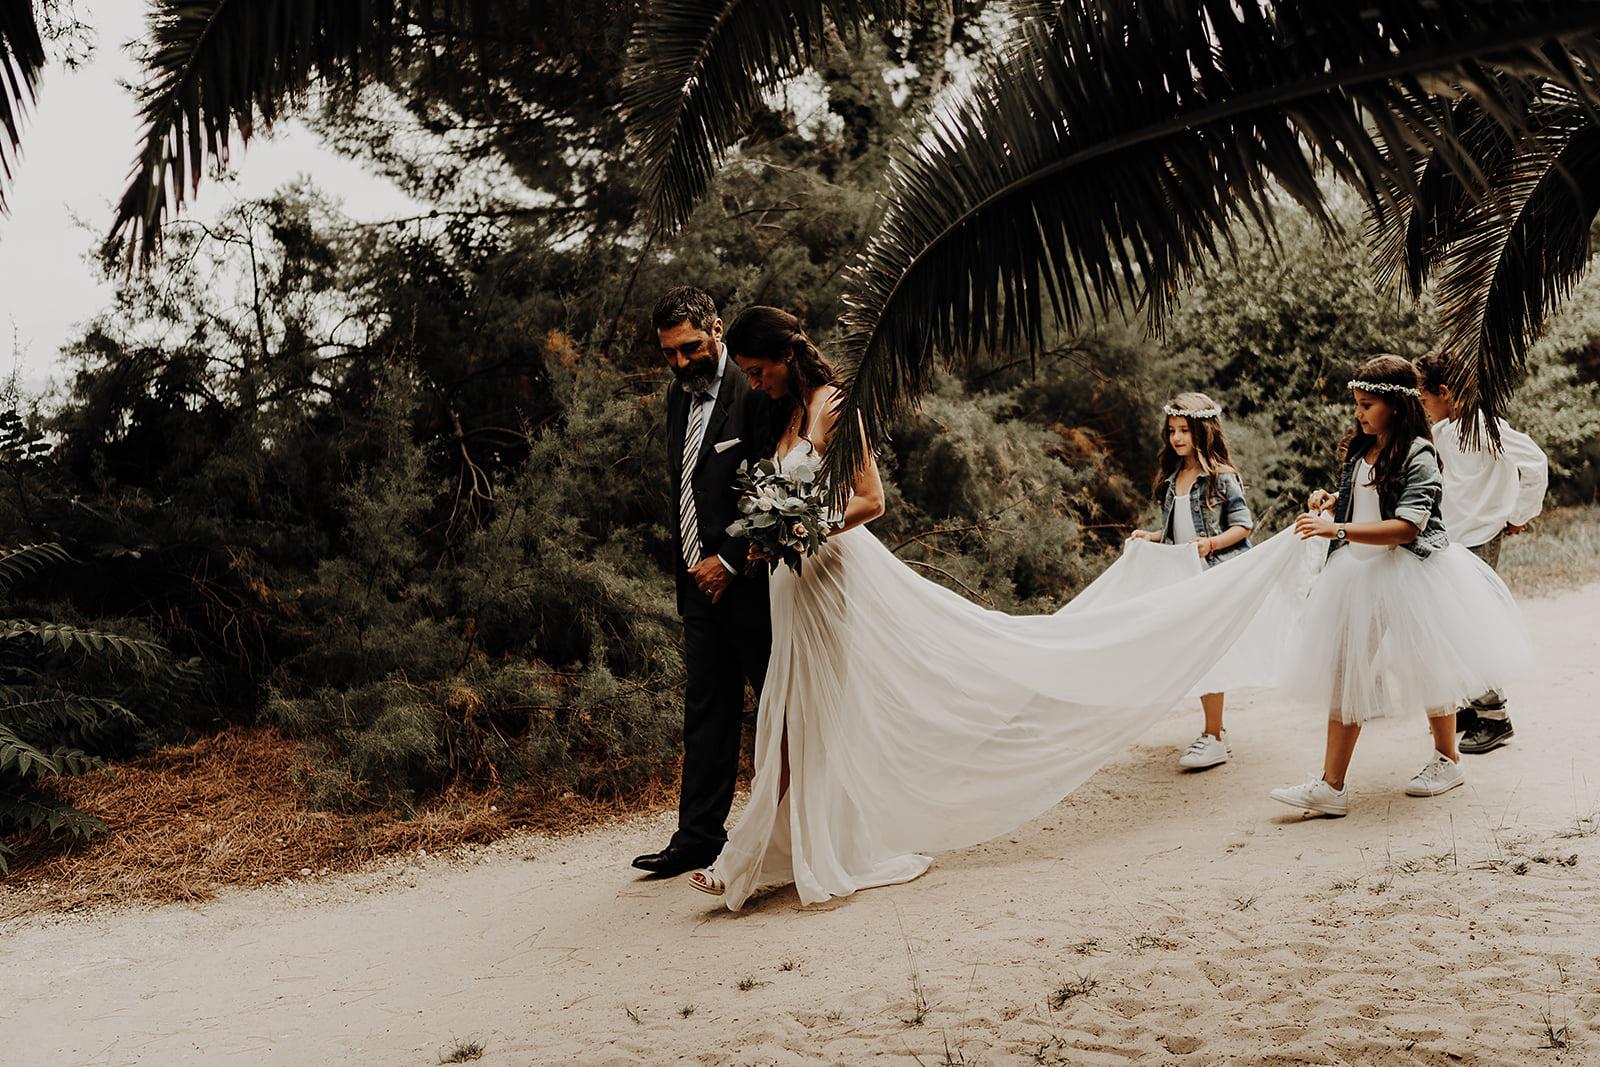 Mariage-cap-ferret-cabane-bartherotte-wedding-planer-bordeaux